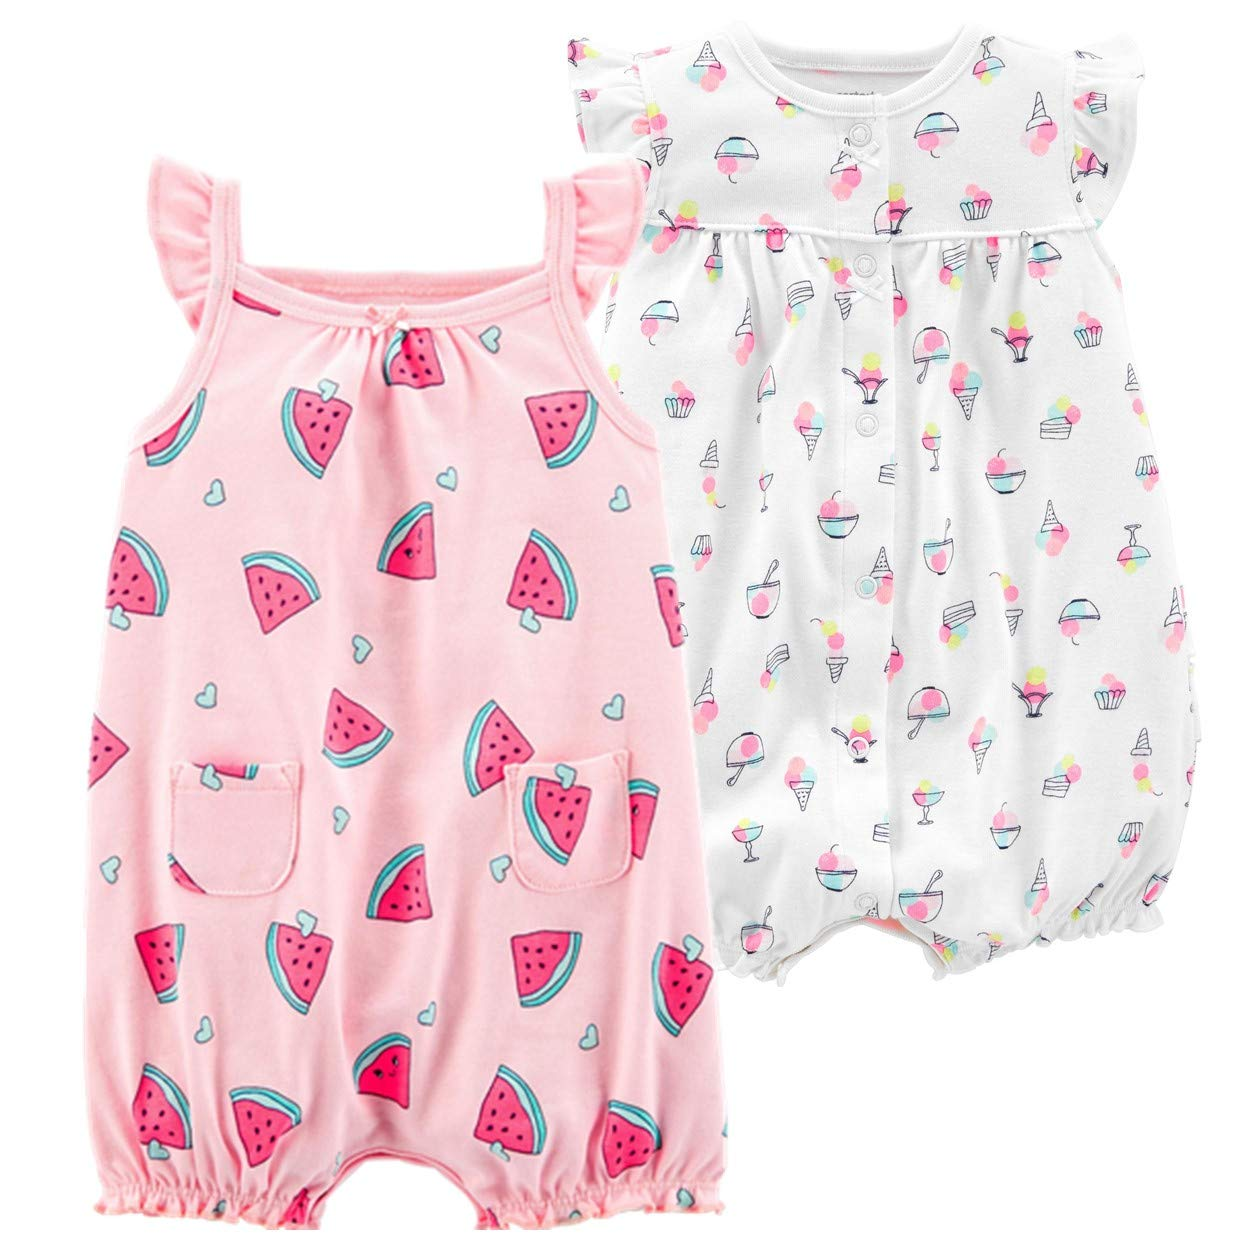 Carter's Baby Girls' 2-Pack Romper, Watermelon/Ice